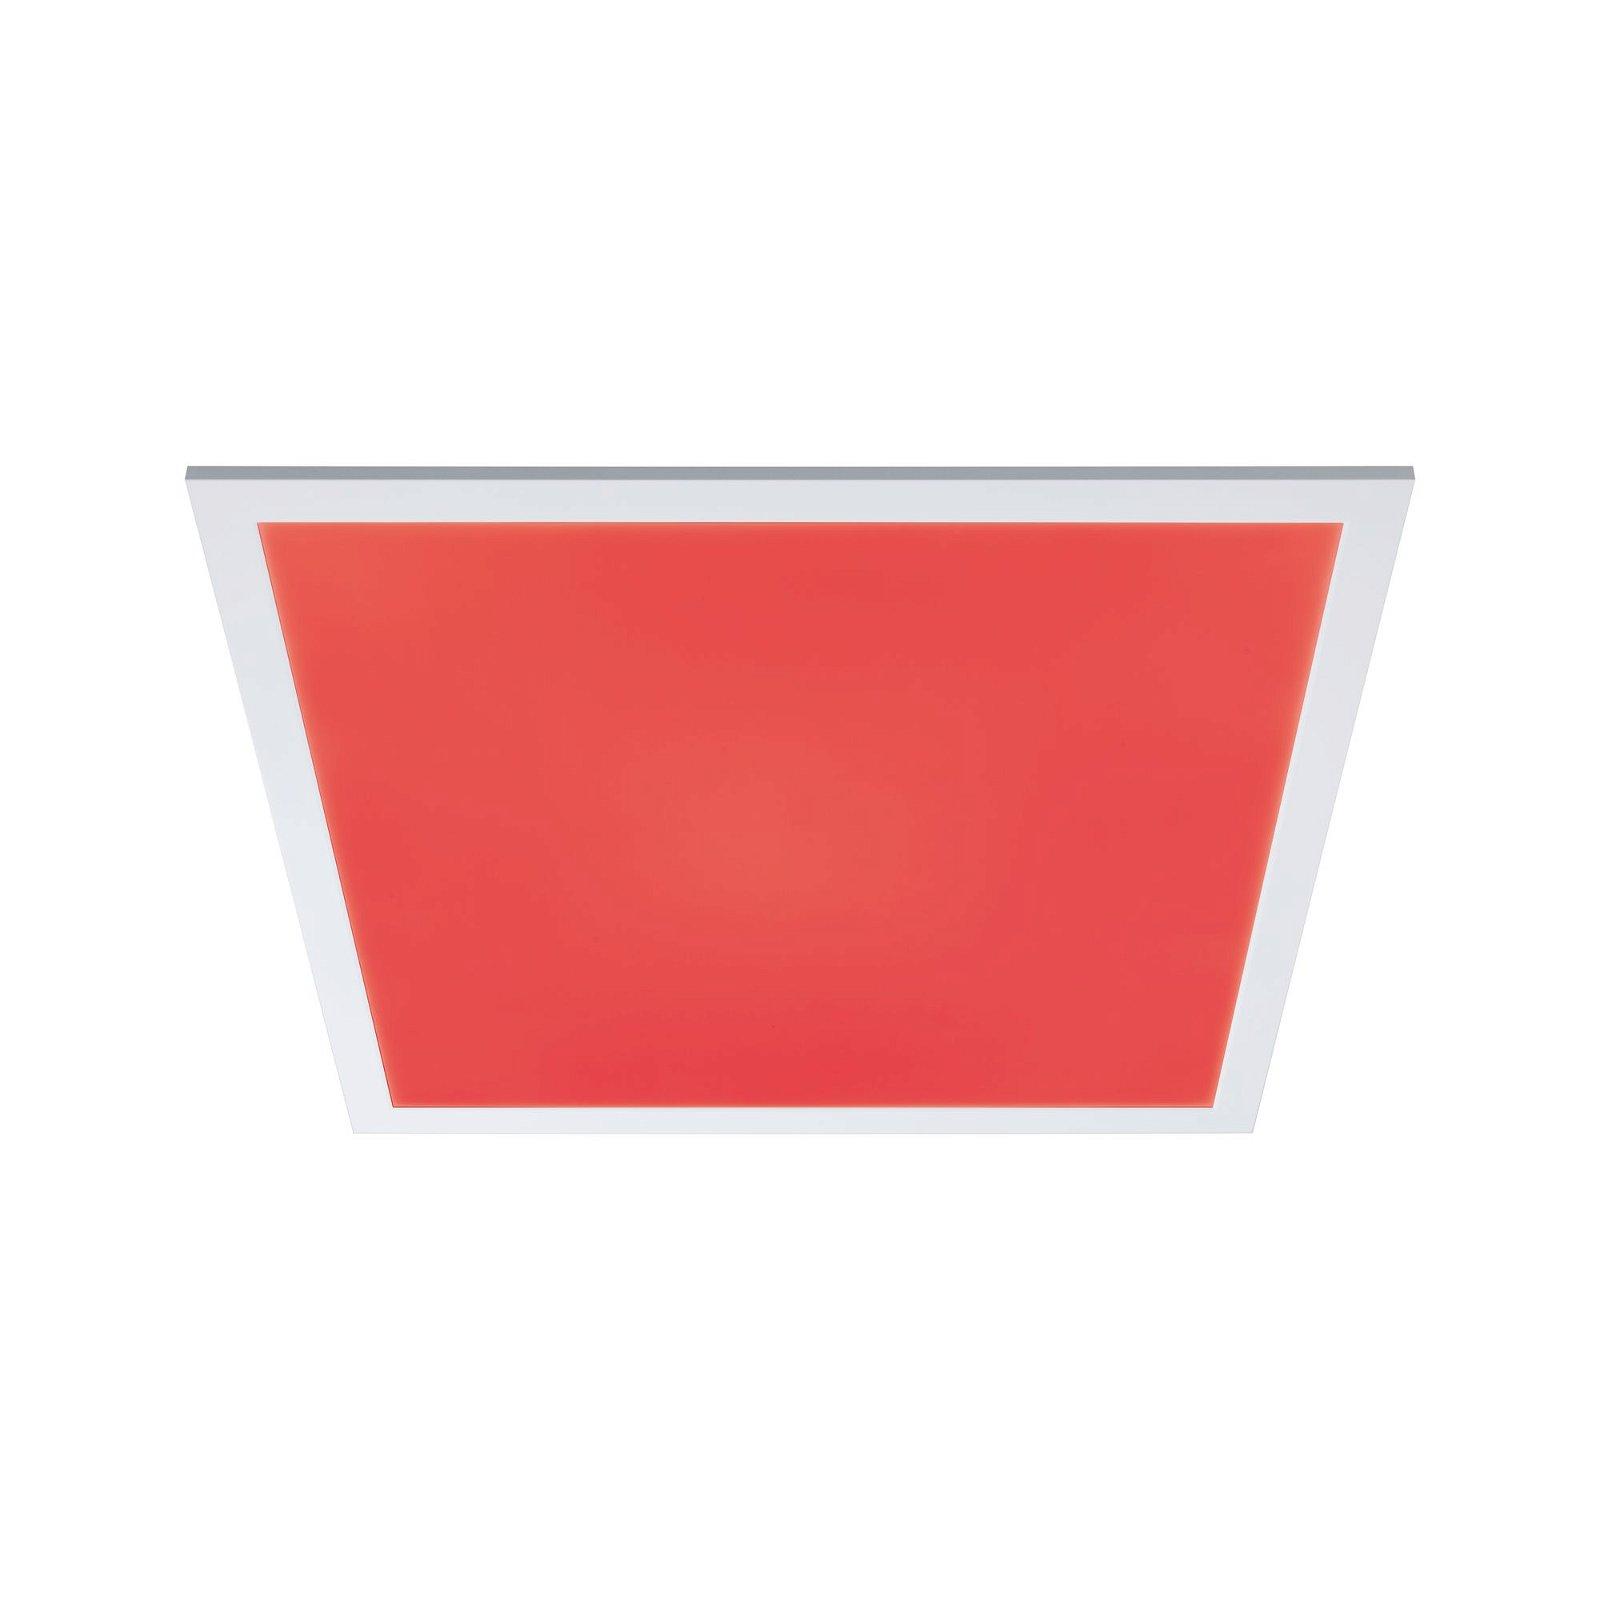 LED Panel Smart Home Zigbee Amaris eckig 595x595mm RGBW Weiß matt